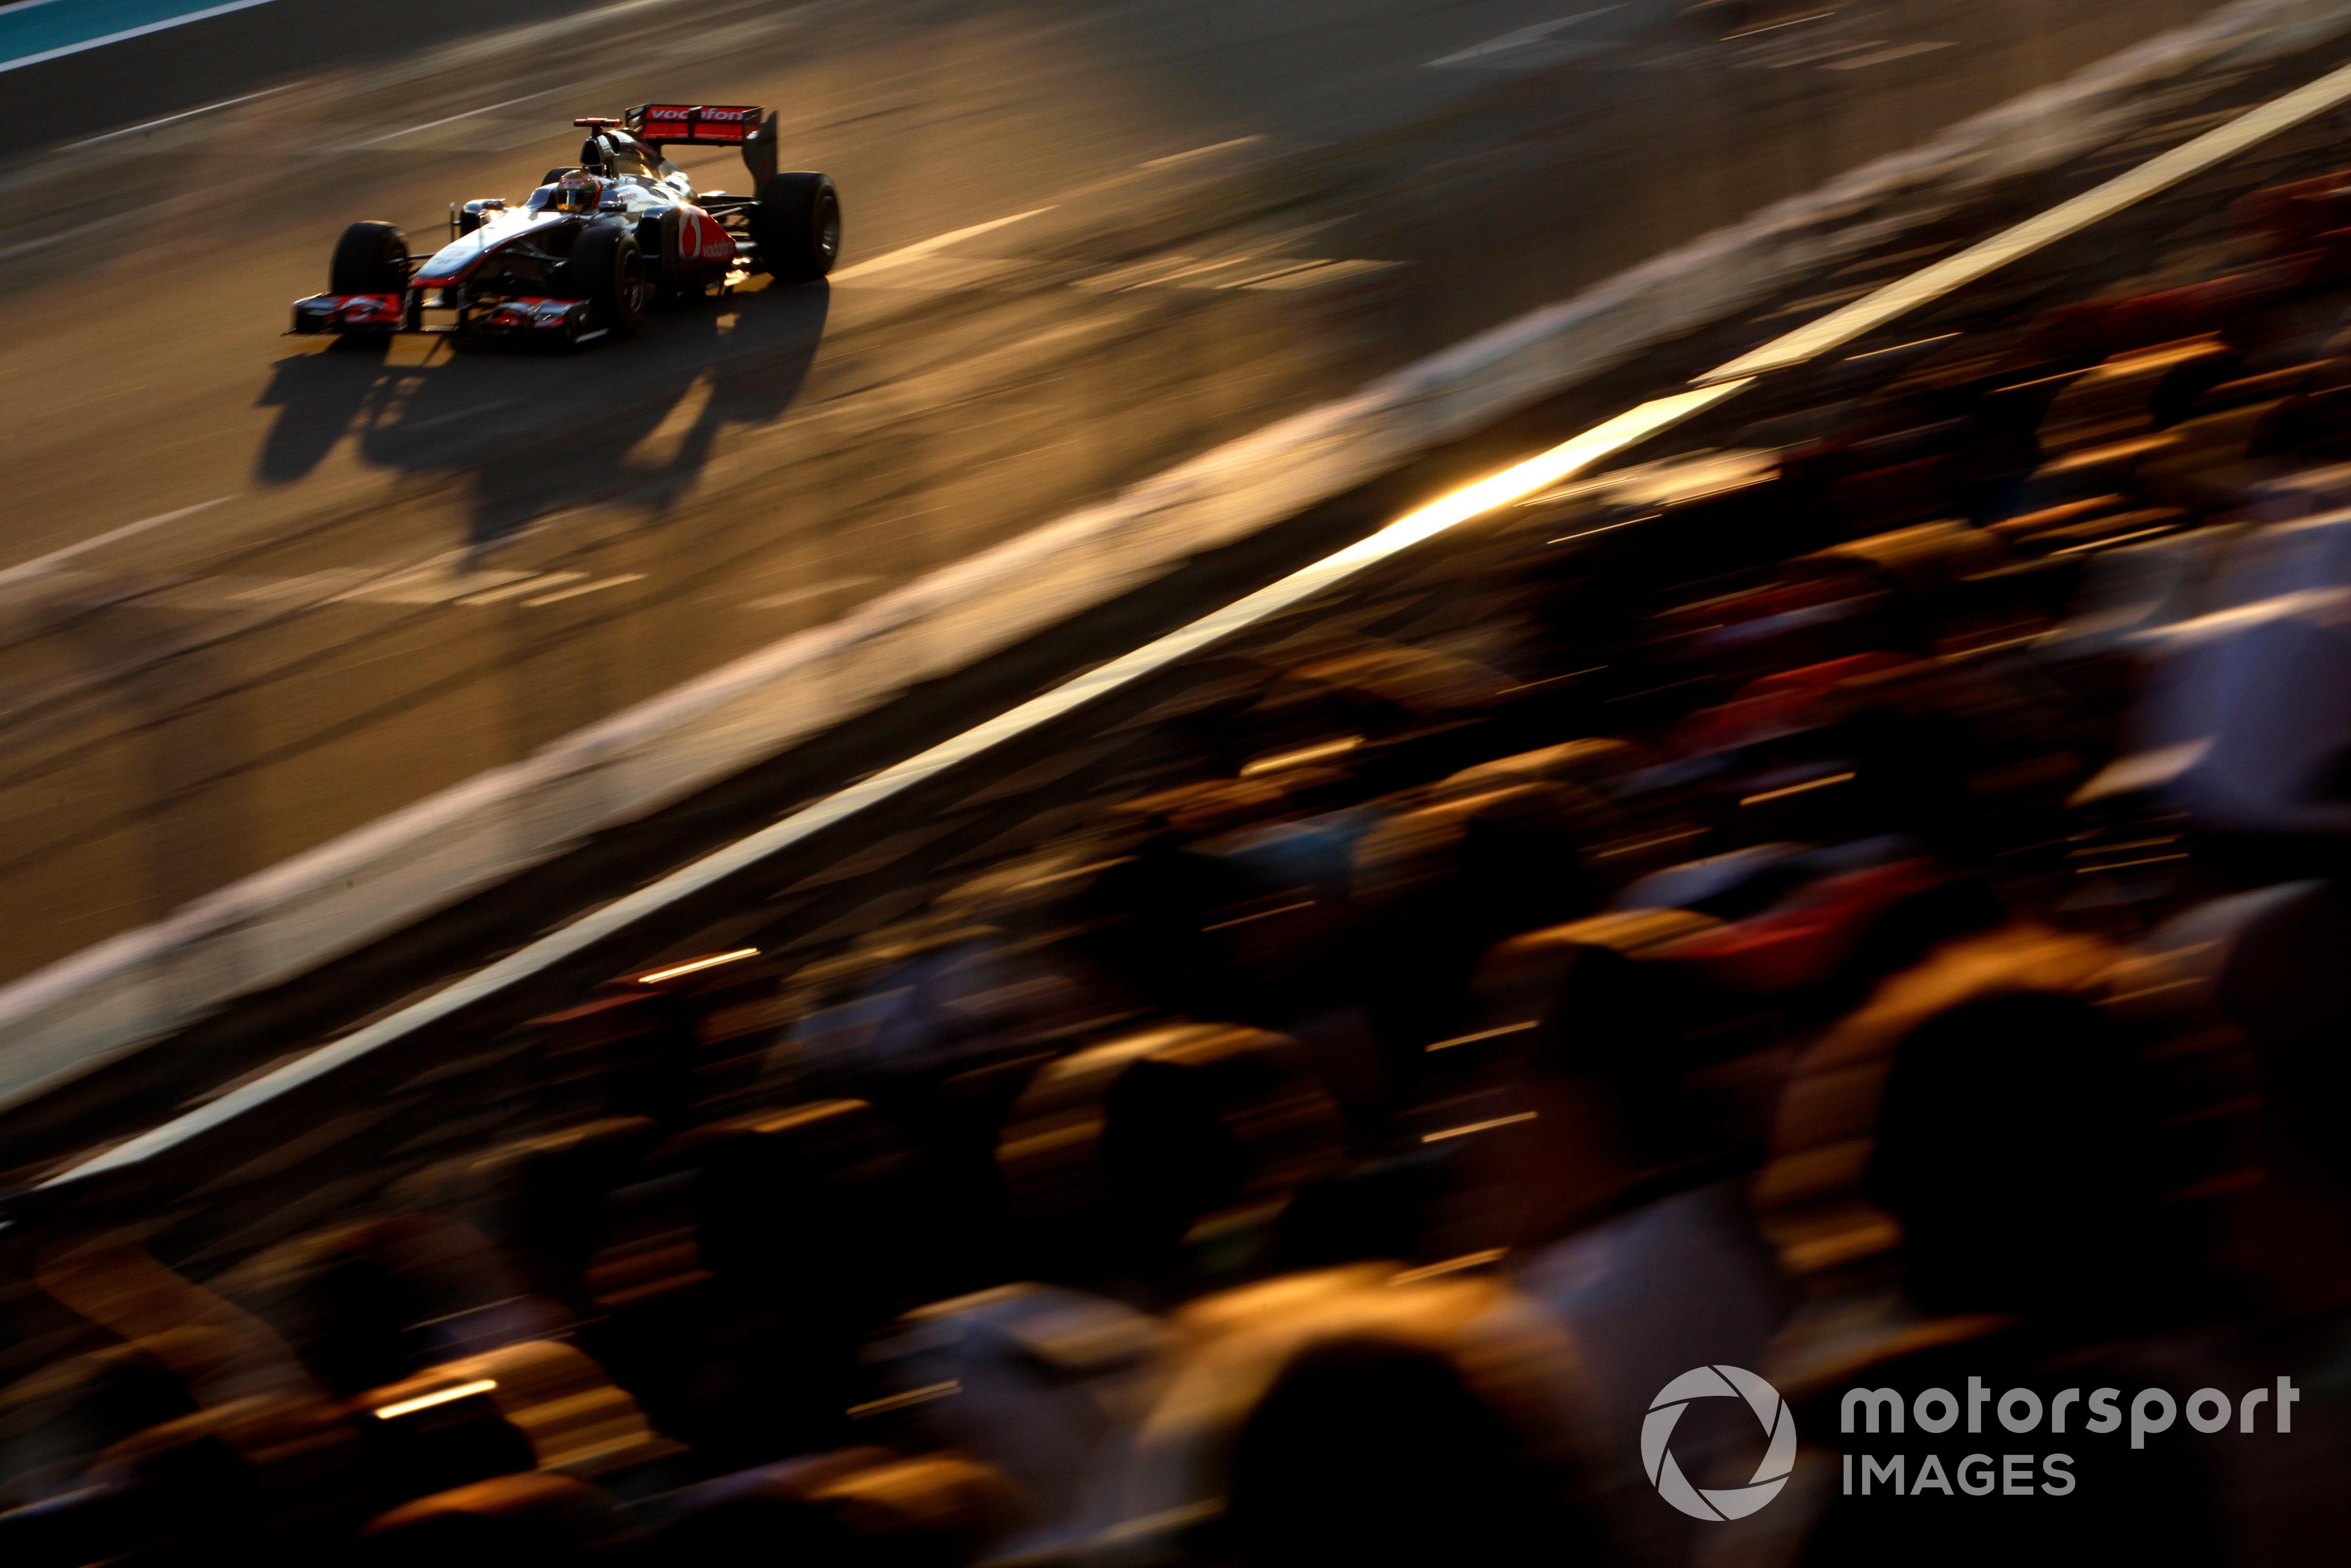 Lewis Hamilton, 2011 Abu Dhabi GP